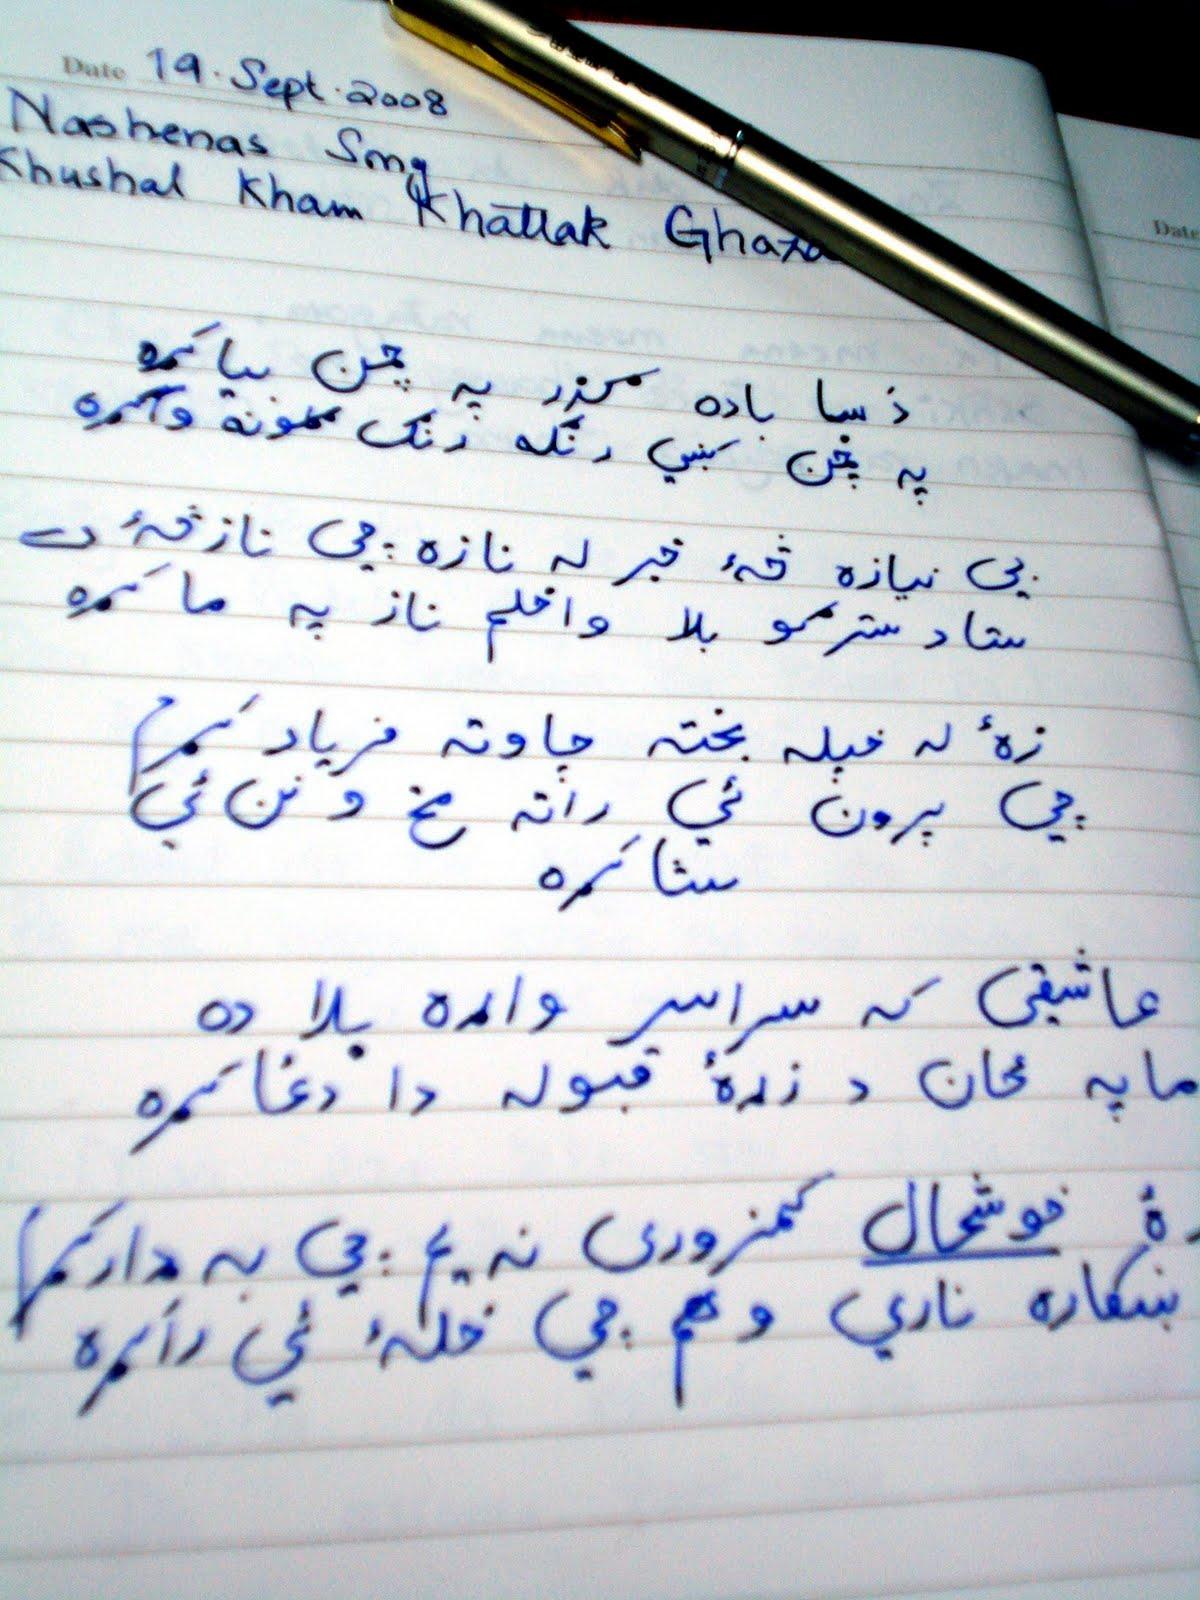 Khoshal khan khatak poetry ~ Welcome to World Poetry Site